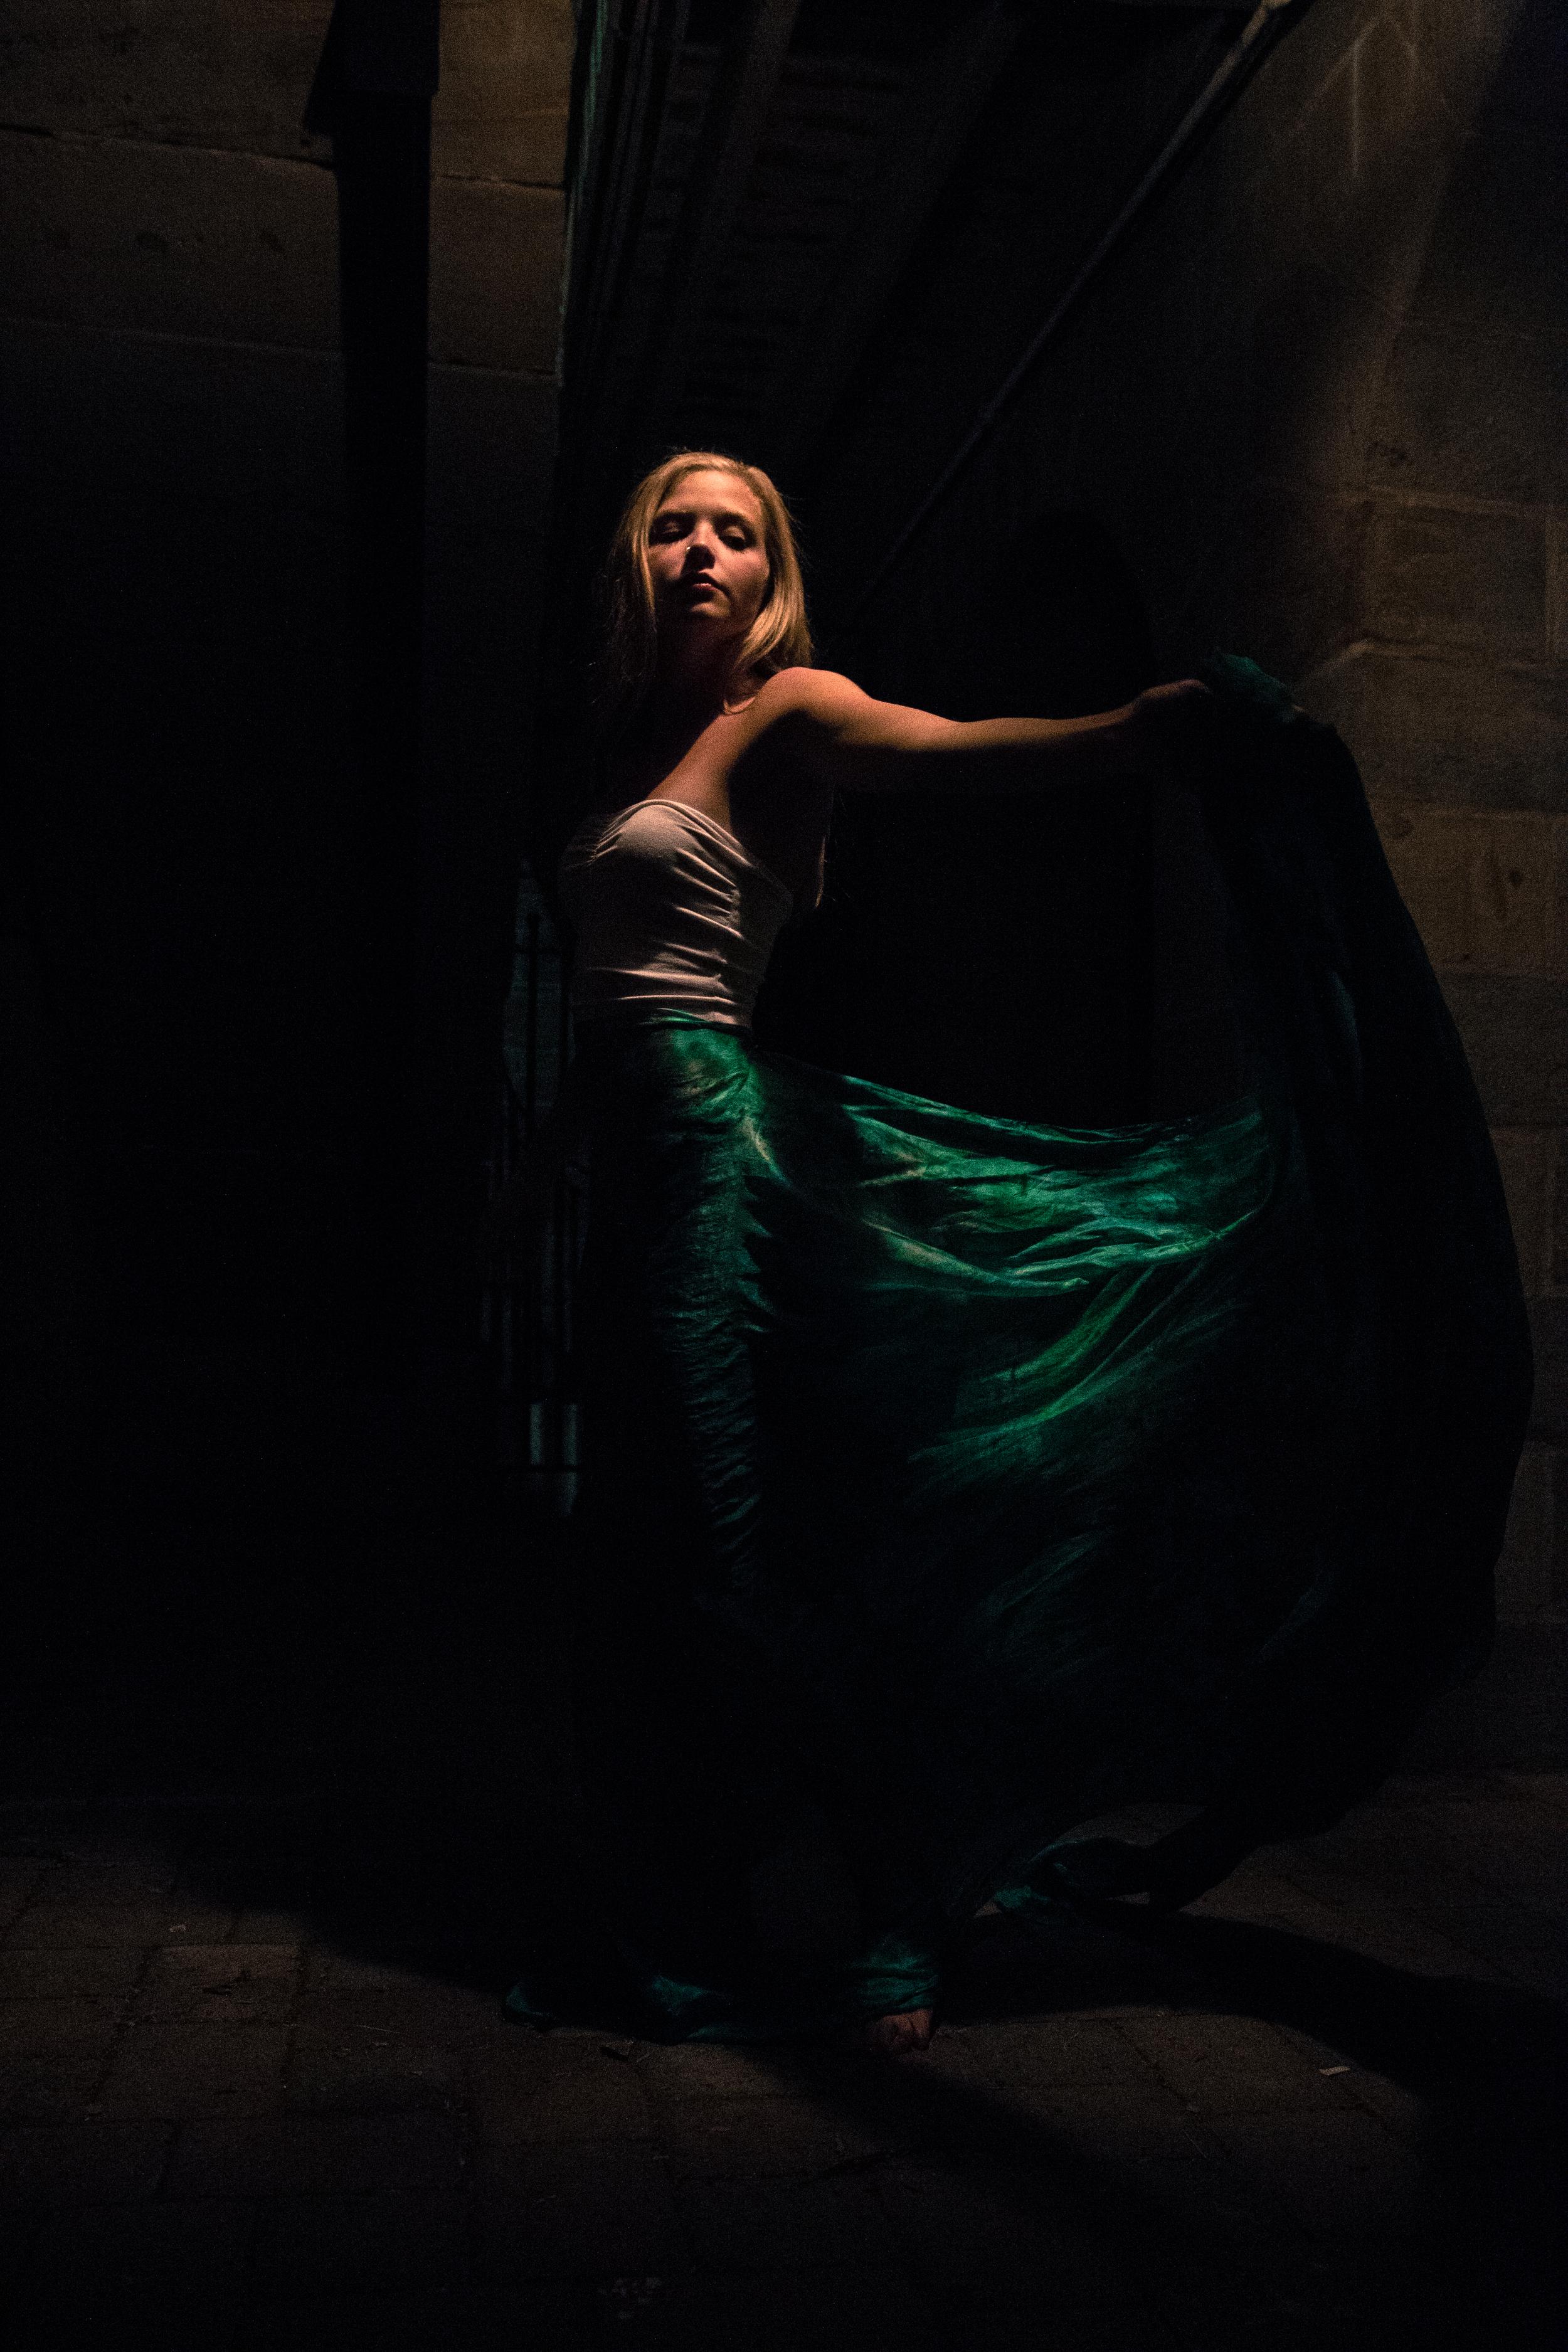 Photography: Barry McCluskey l Model: Victoria Deveau l Designer/Producer: Dee Wilkie